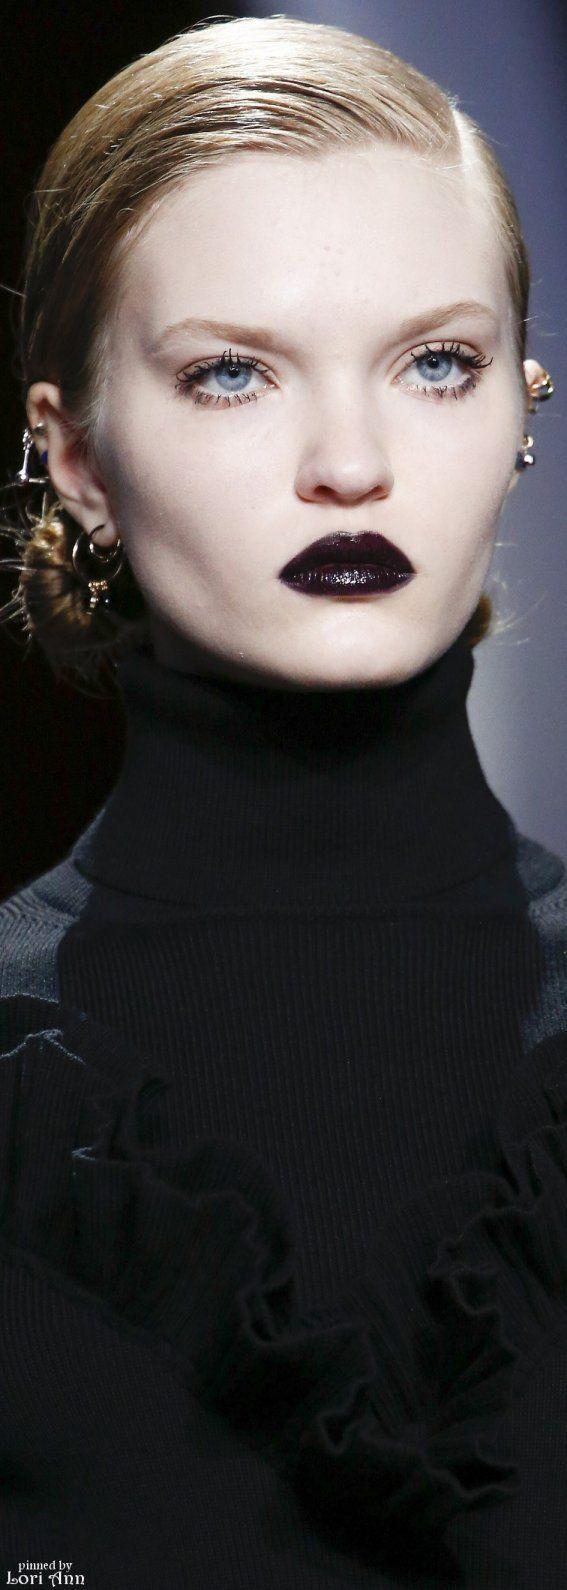 Christian Dior Fall 2016 RTW ✏✏✏✏✏✏✏✏✏✏✏✏✏✏✏✏  FʀᴇɴᴄʜVɪɴᴛᴀɢᴇJᴇᴡᴇʟʀʏ   ☞ https://www.etsy.com/shop/frenchjewelryvintage?ref=l2-shopheader-name ══════════════════════  Gᴀʙʏ﹣Fᴇ́ᴇʀɪᴇ Jᴇᴡᴇʟʀʏ ☞ https://www.alittlemarket.com/boutique/gaby_feerie-132444.html ✏✏✏✏✏✏✏✏✏✏✏✏✏✏✏✏